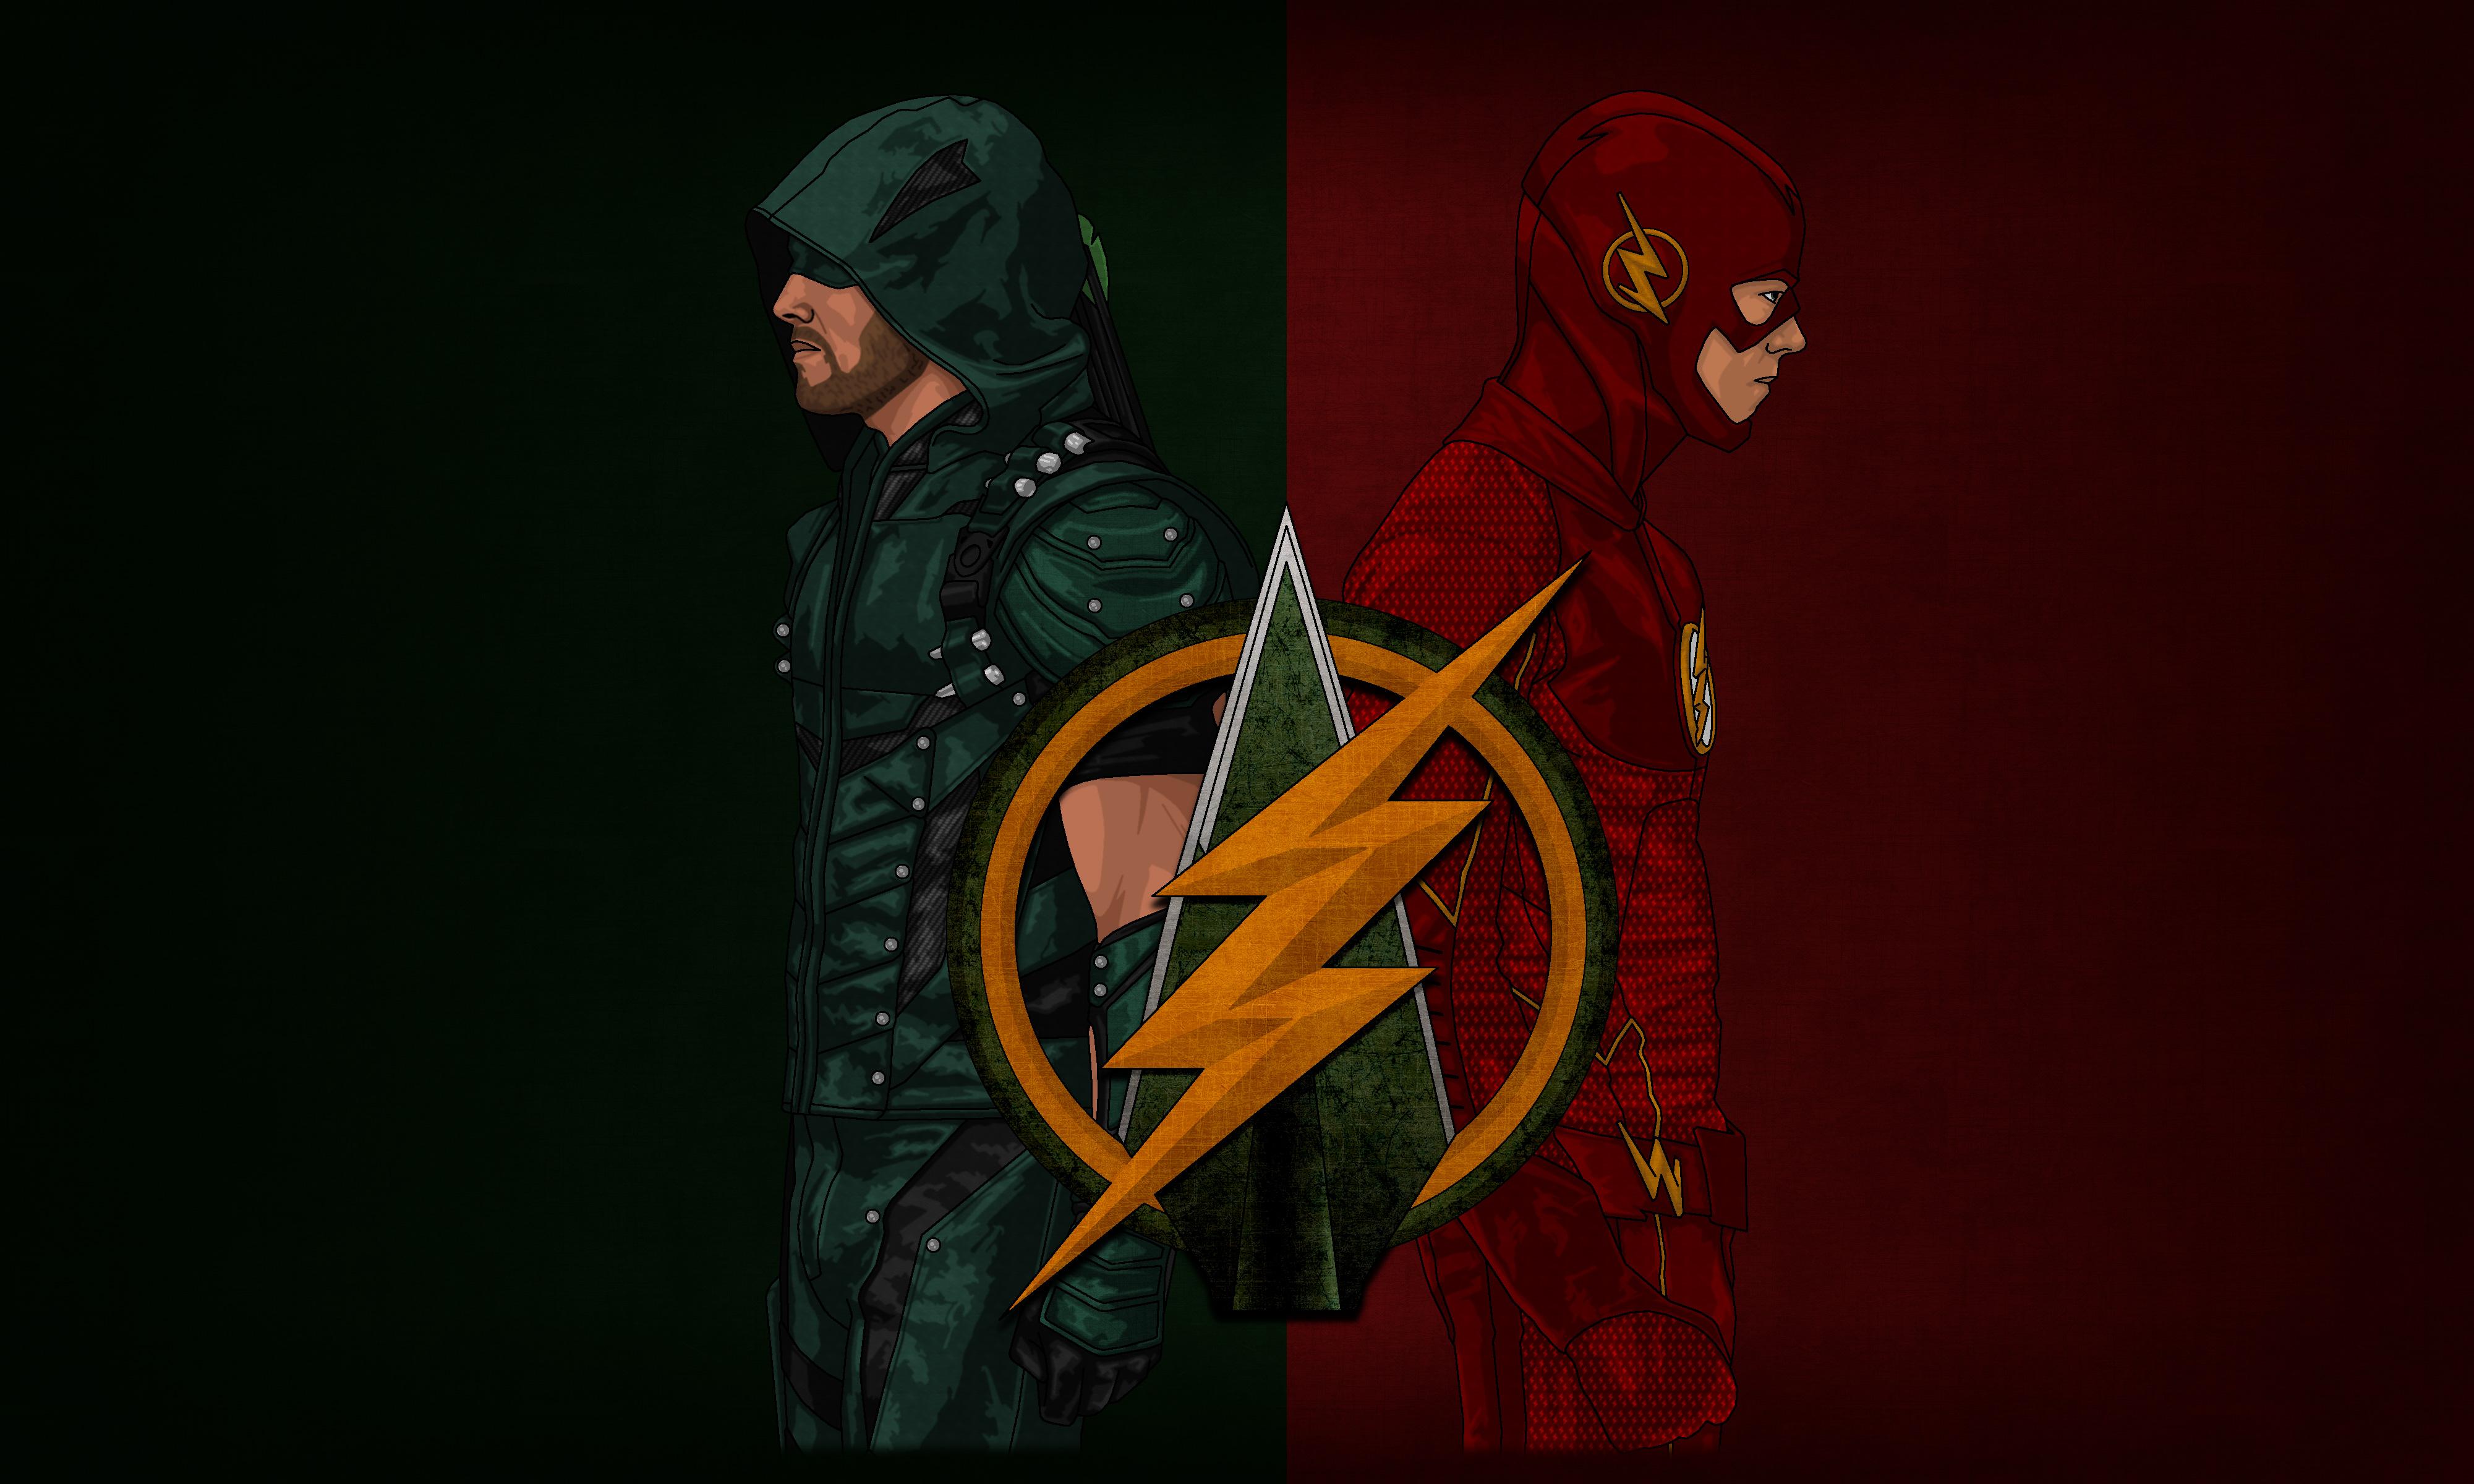 Arrow Flash Artwork 4k Hd Tv Shows 4k Wallpapers Images